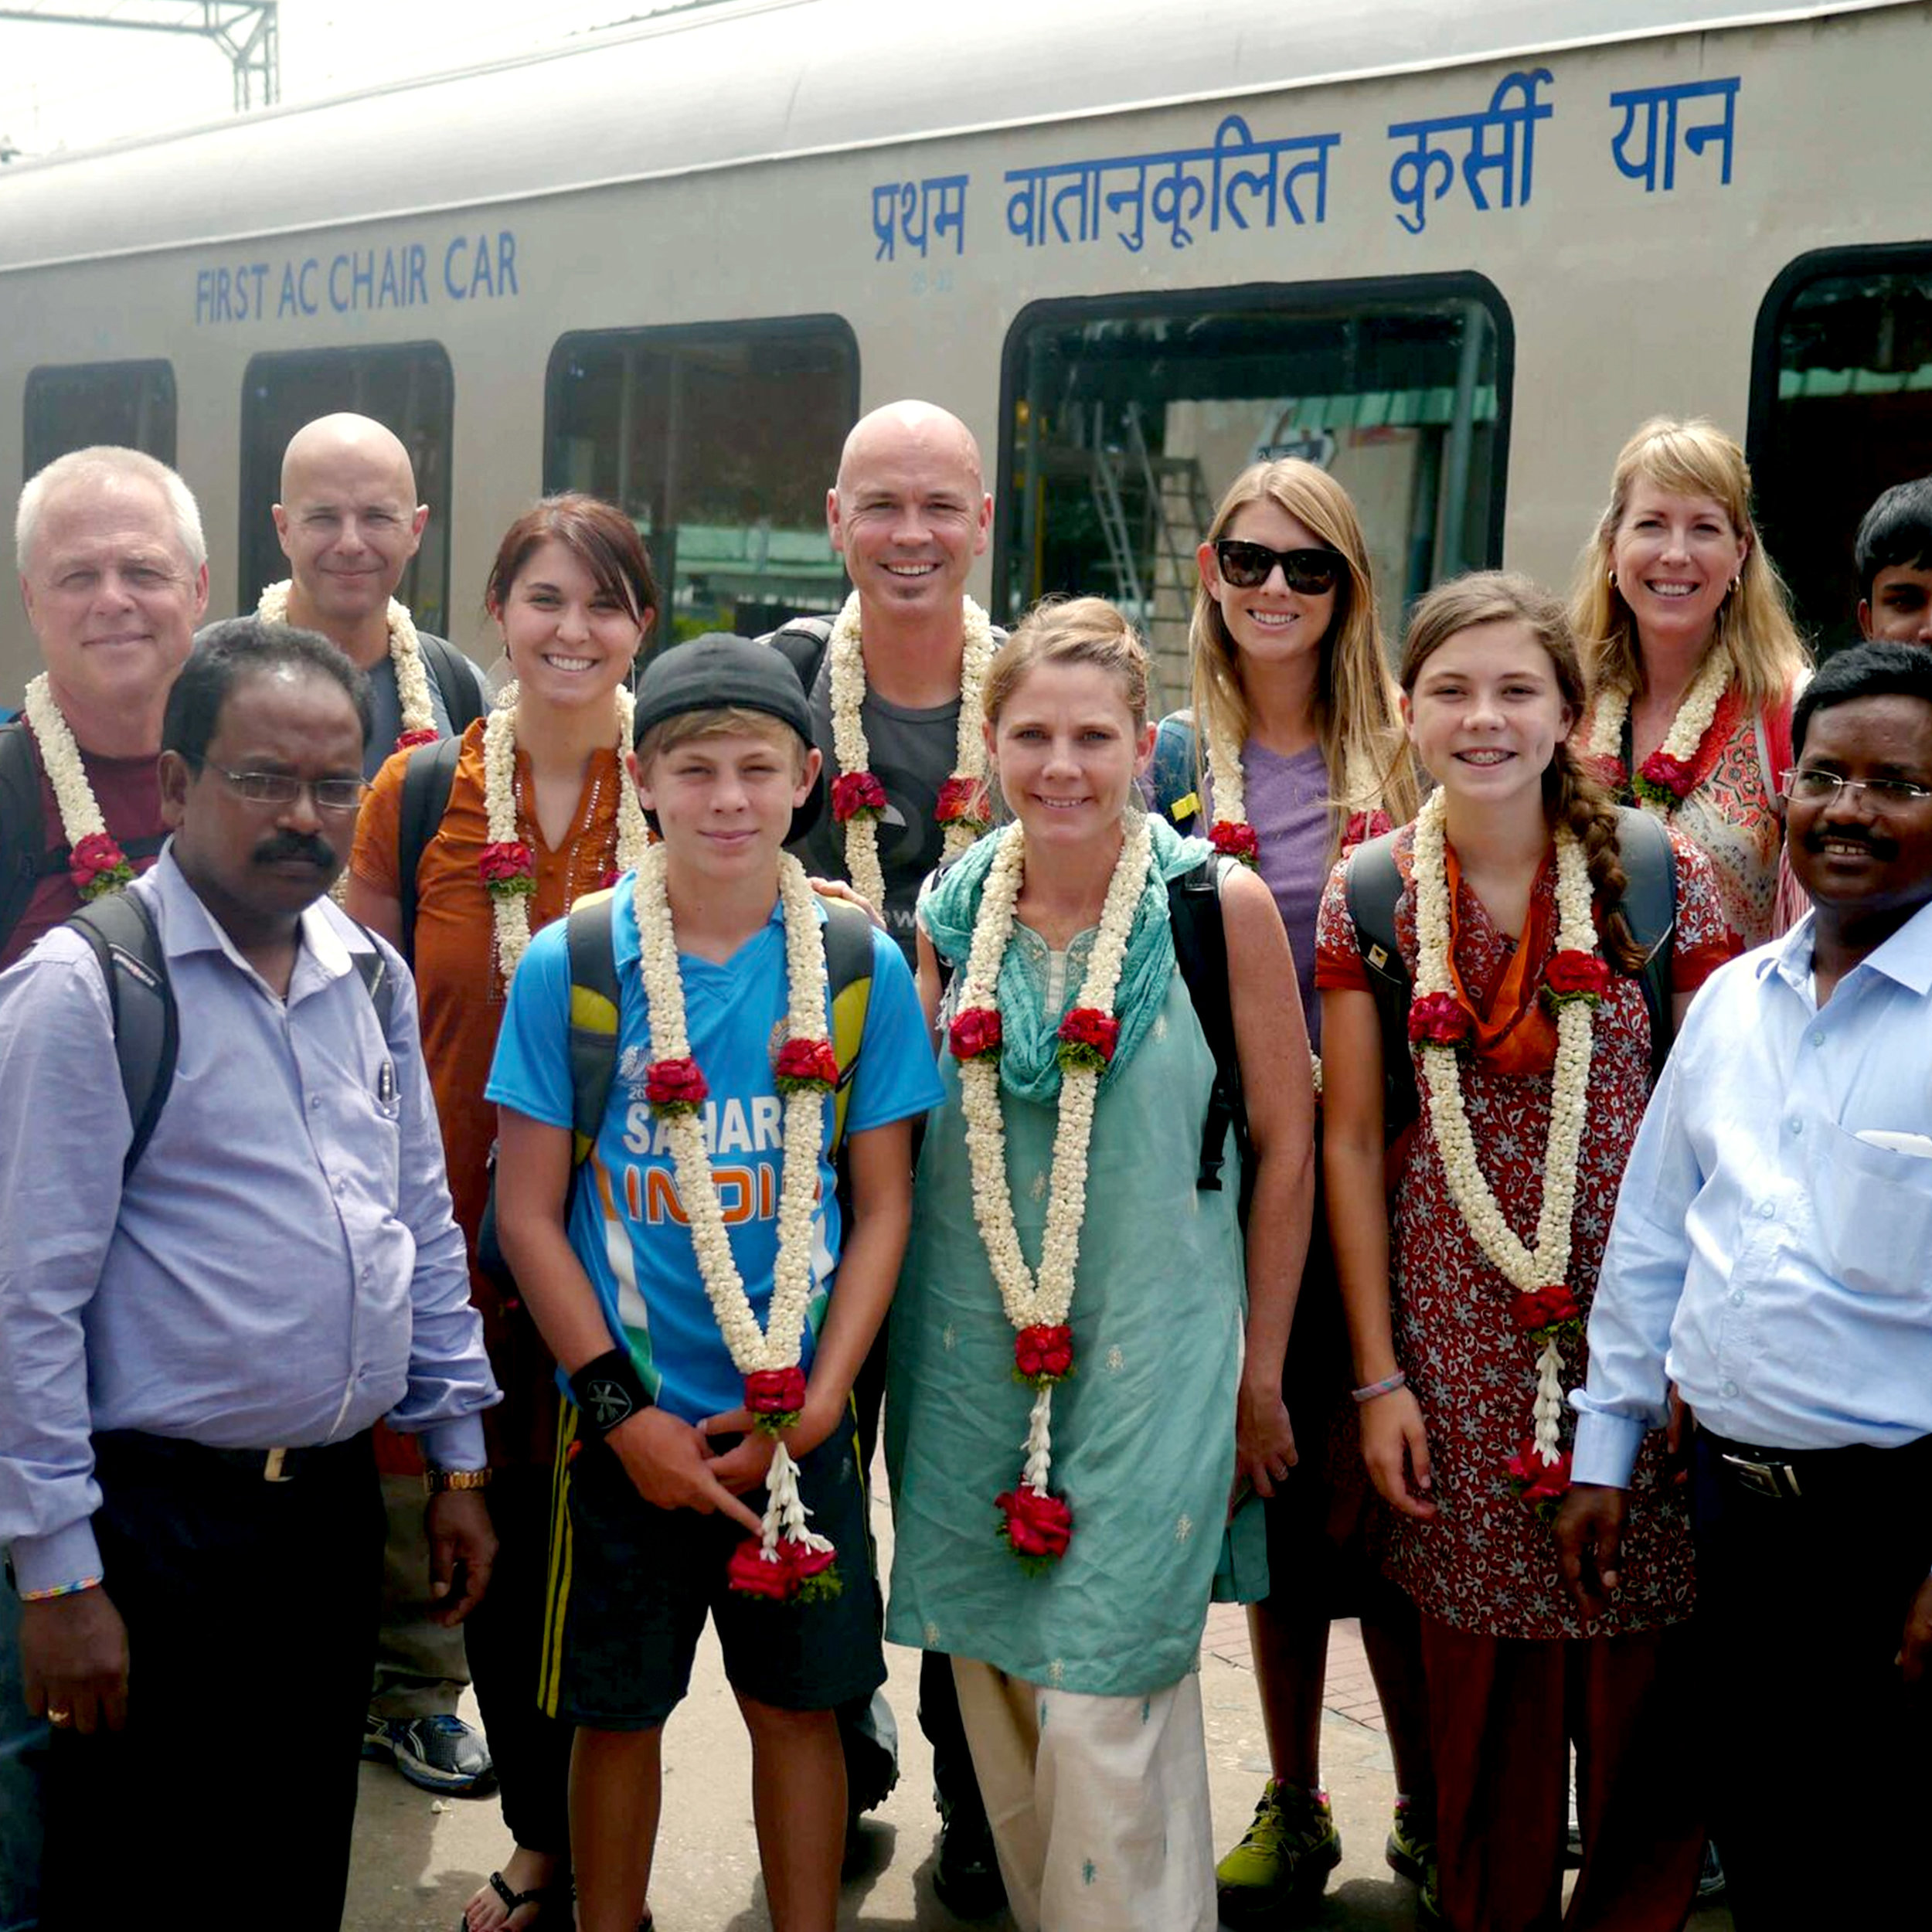 india trip 2018 photo 1.jpg